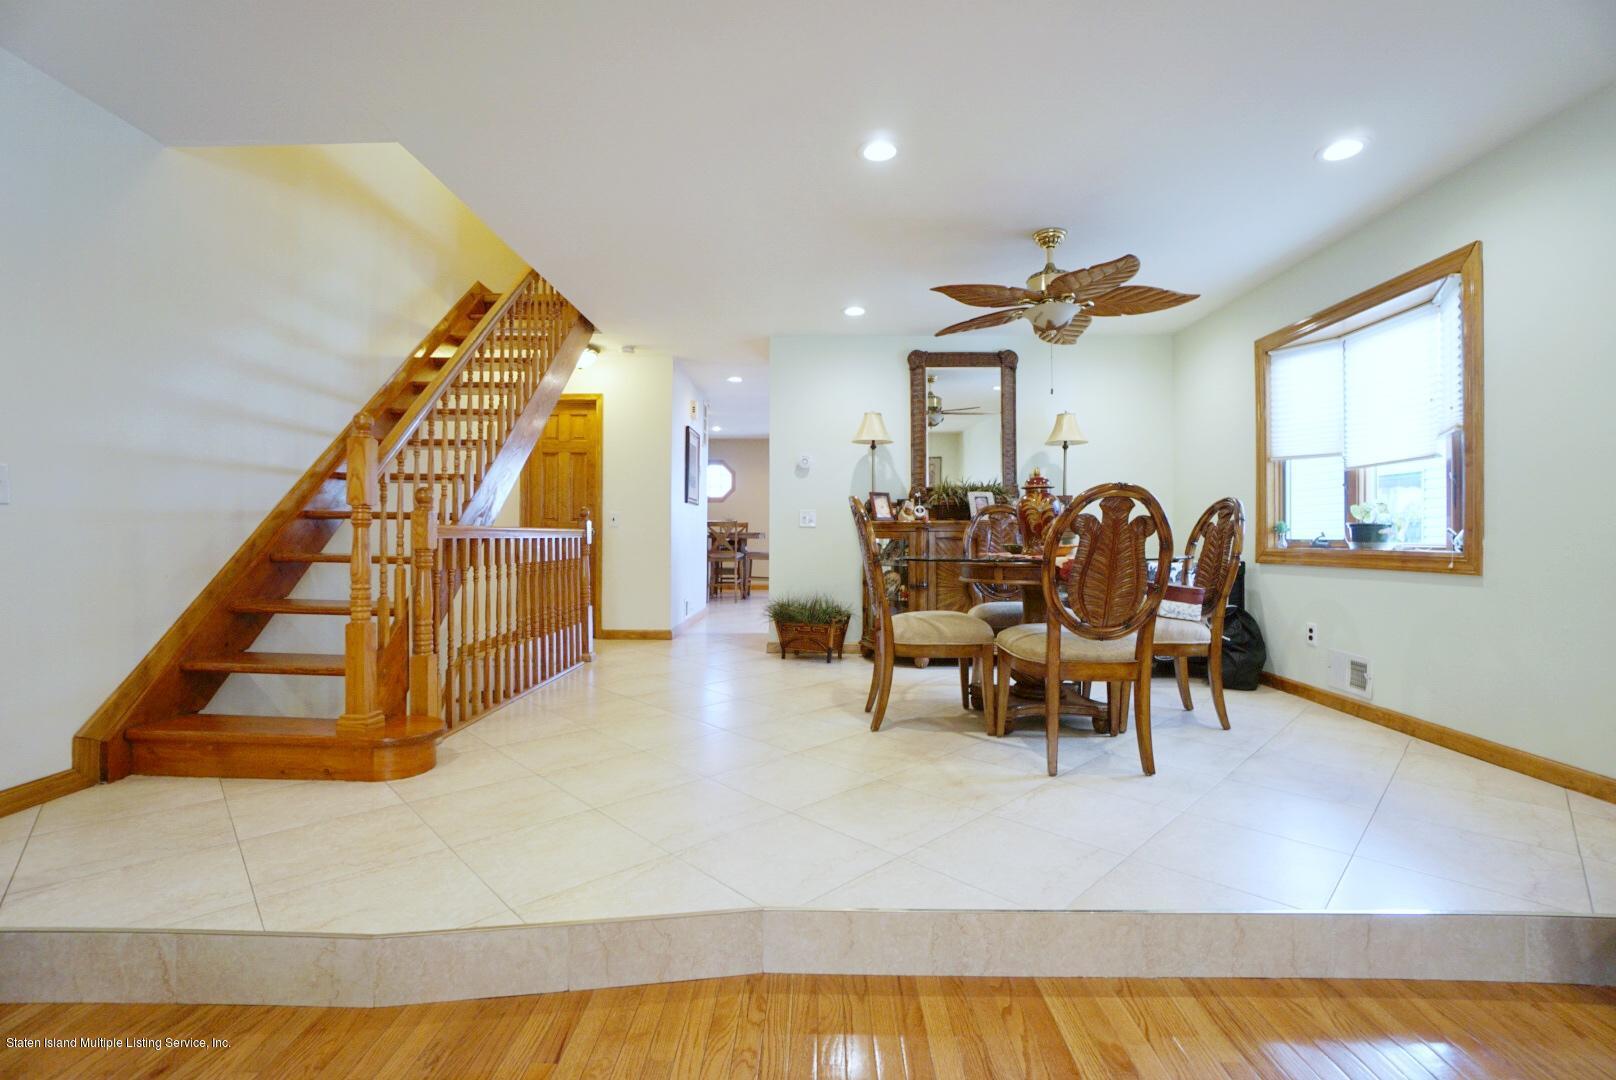 Single Family - Semi-Attached 47 Ilyse Court   Staten Island, NY 10306, MLS-1141335-4